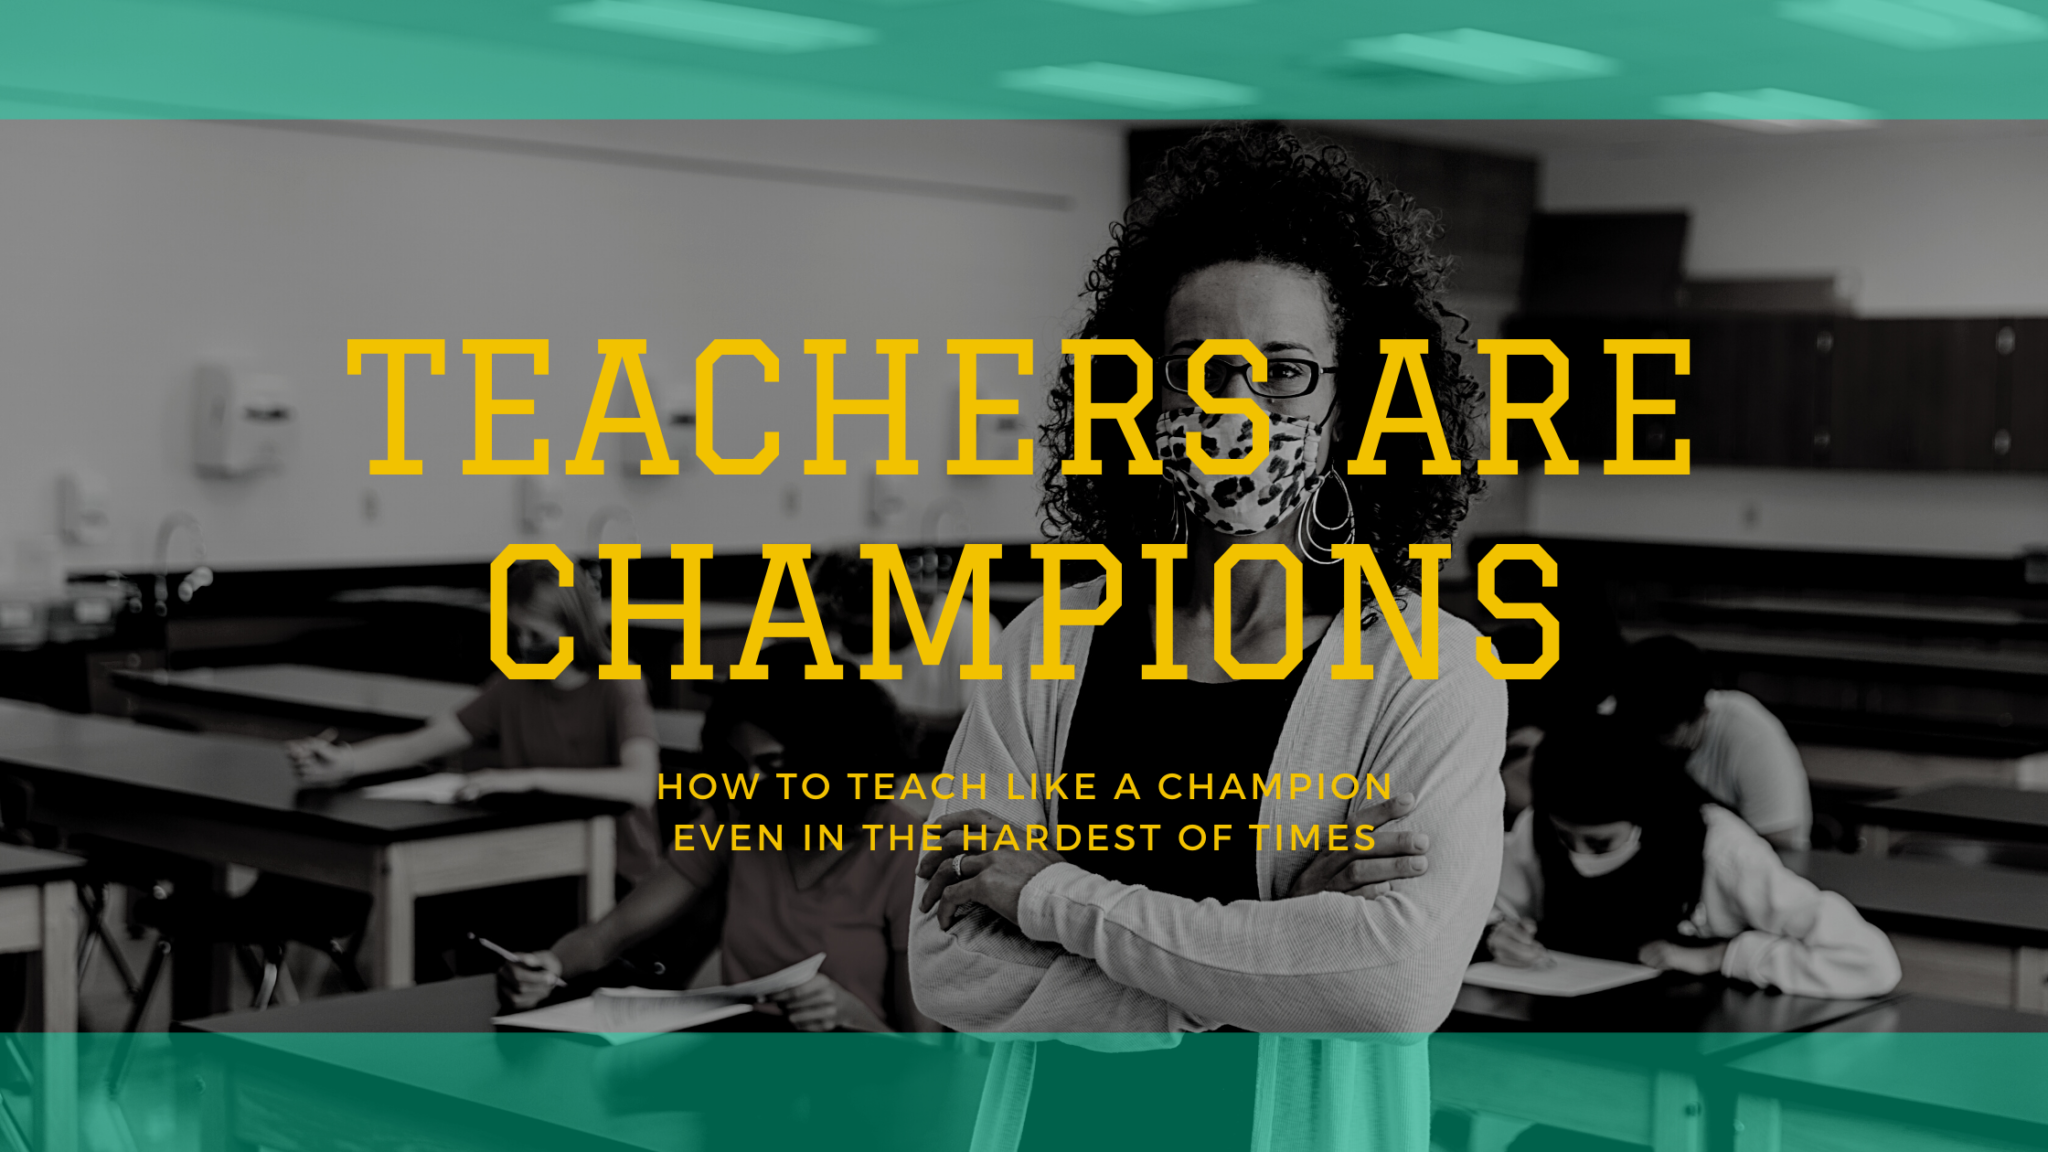 Teachers are Champions